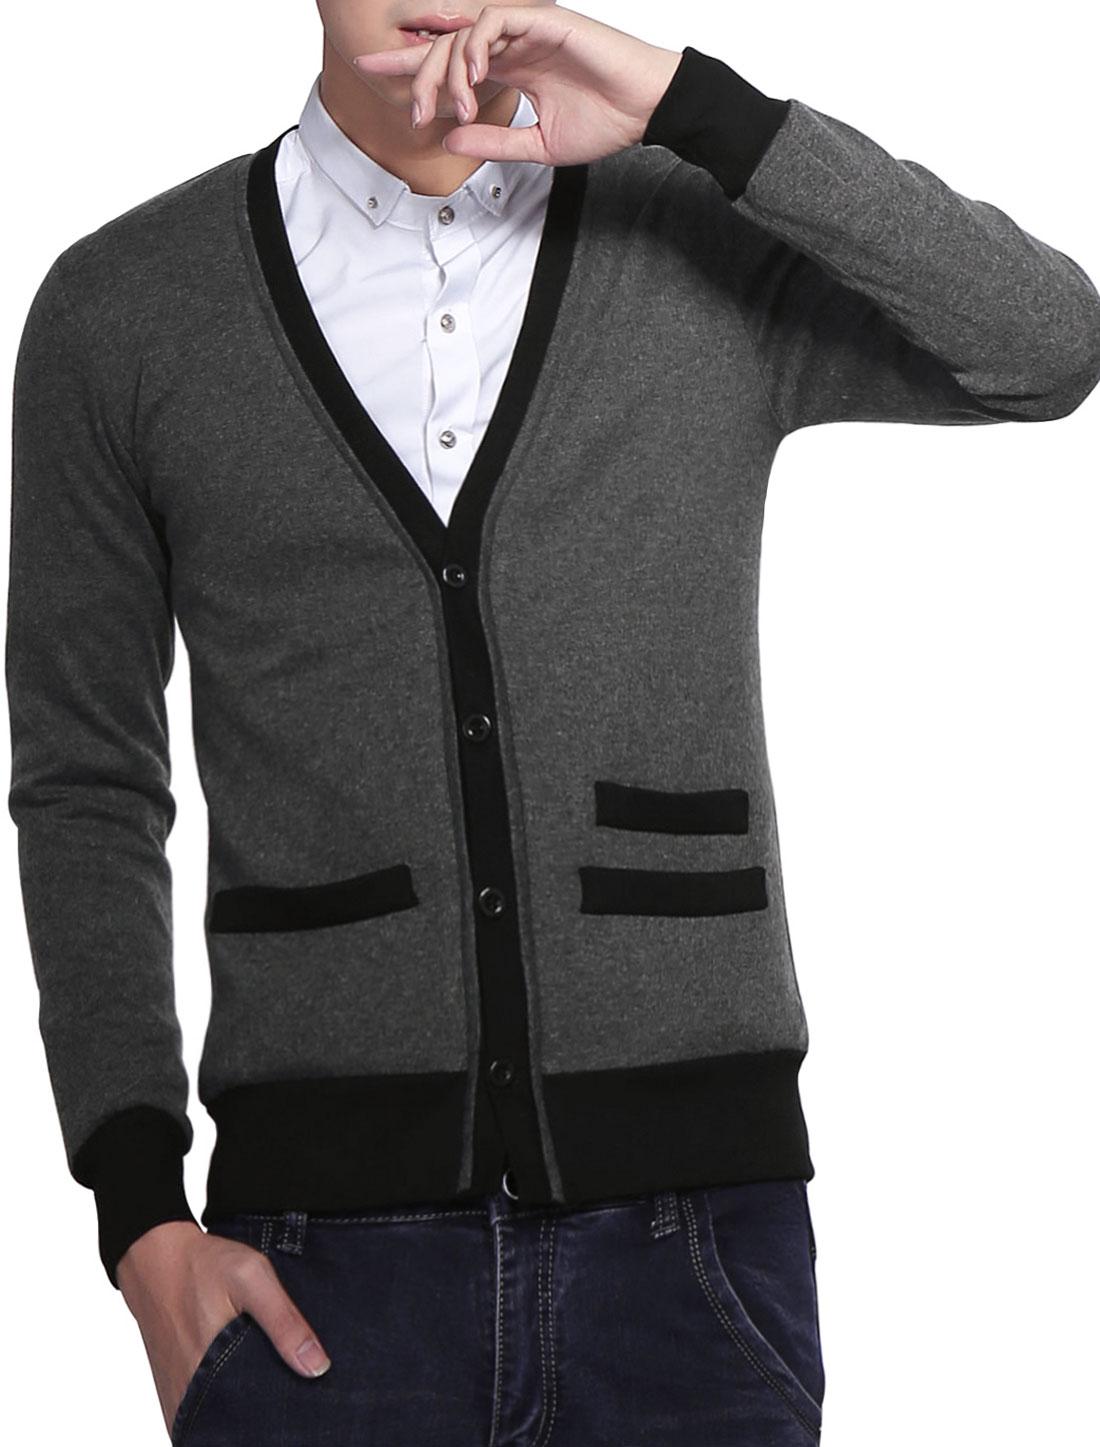 Mens Stylish Dark Gray Long Sleeve Pockets Detail Cardigan L